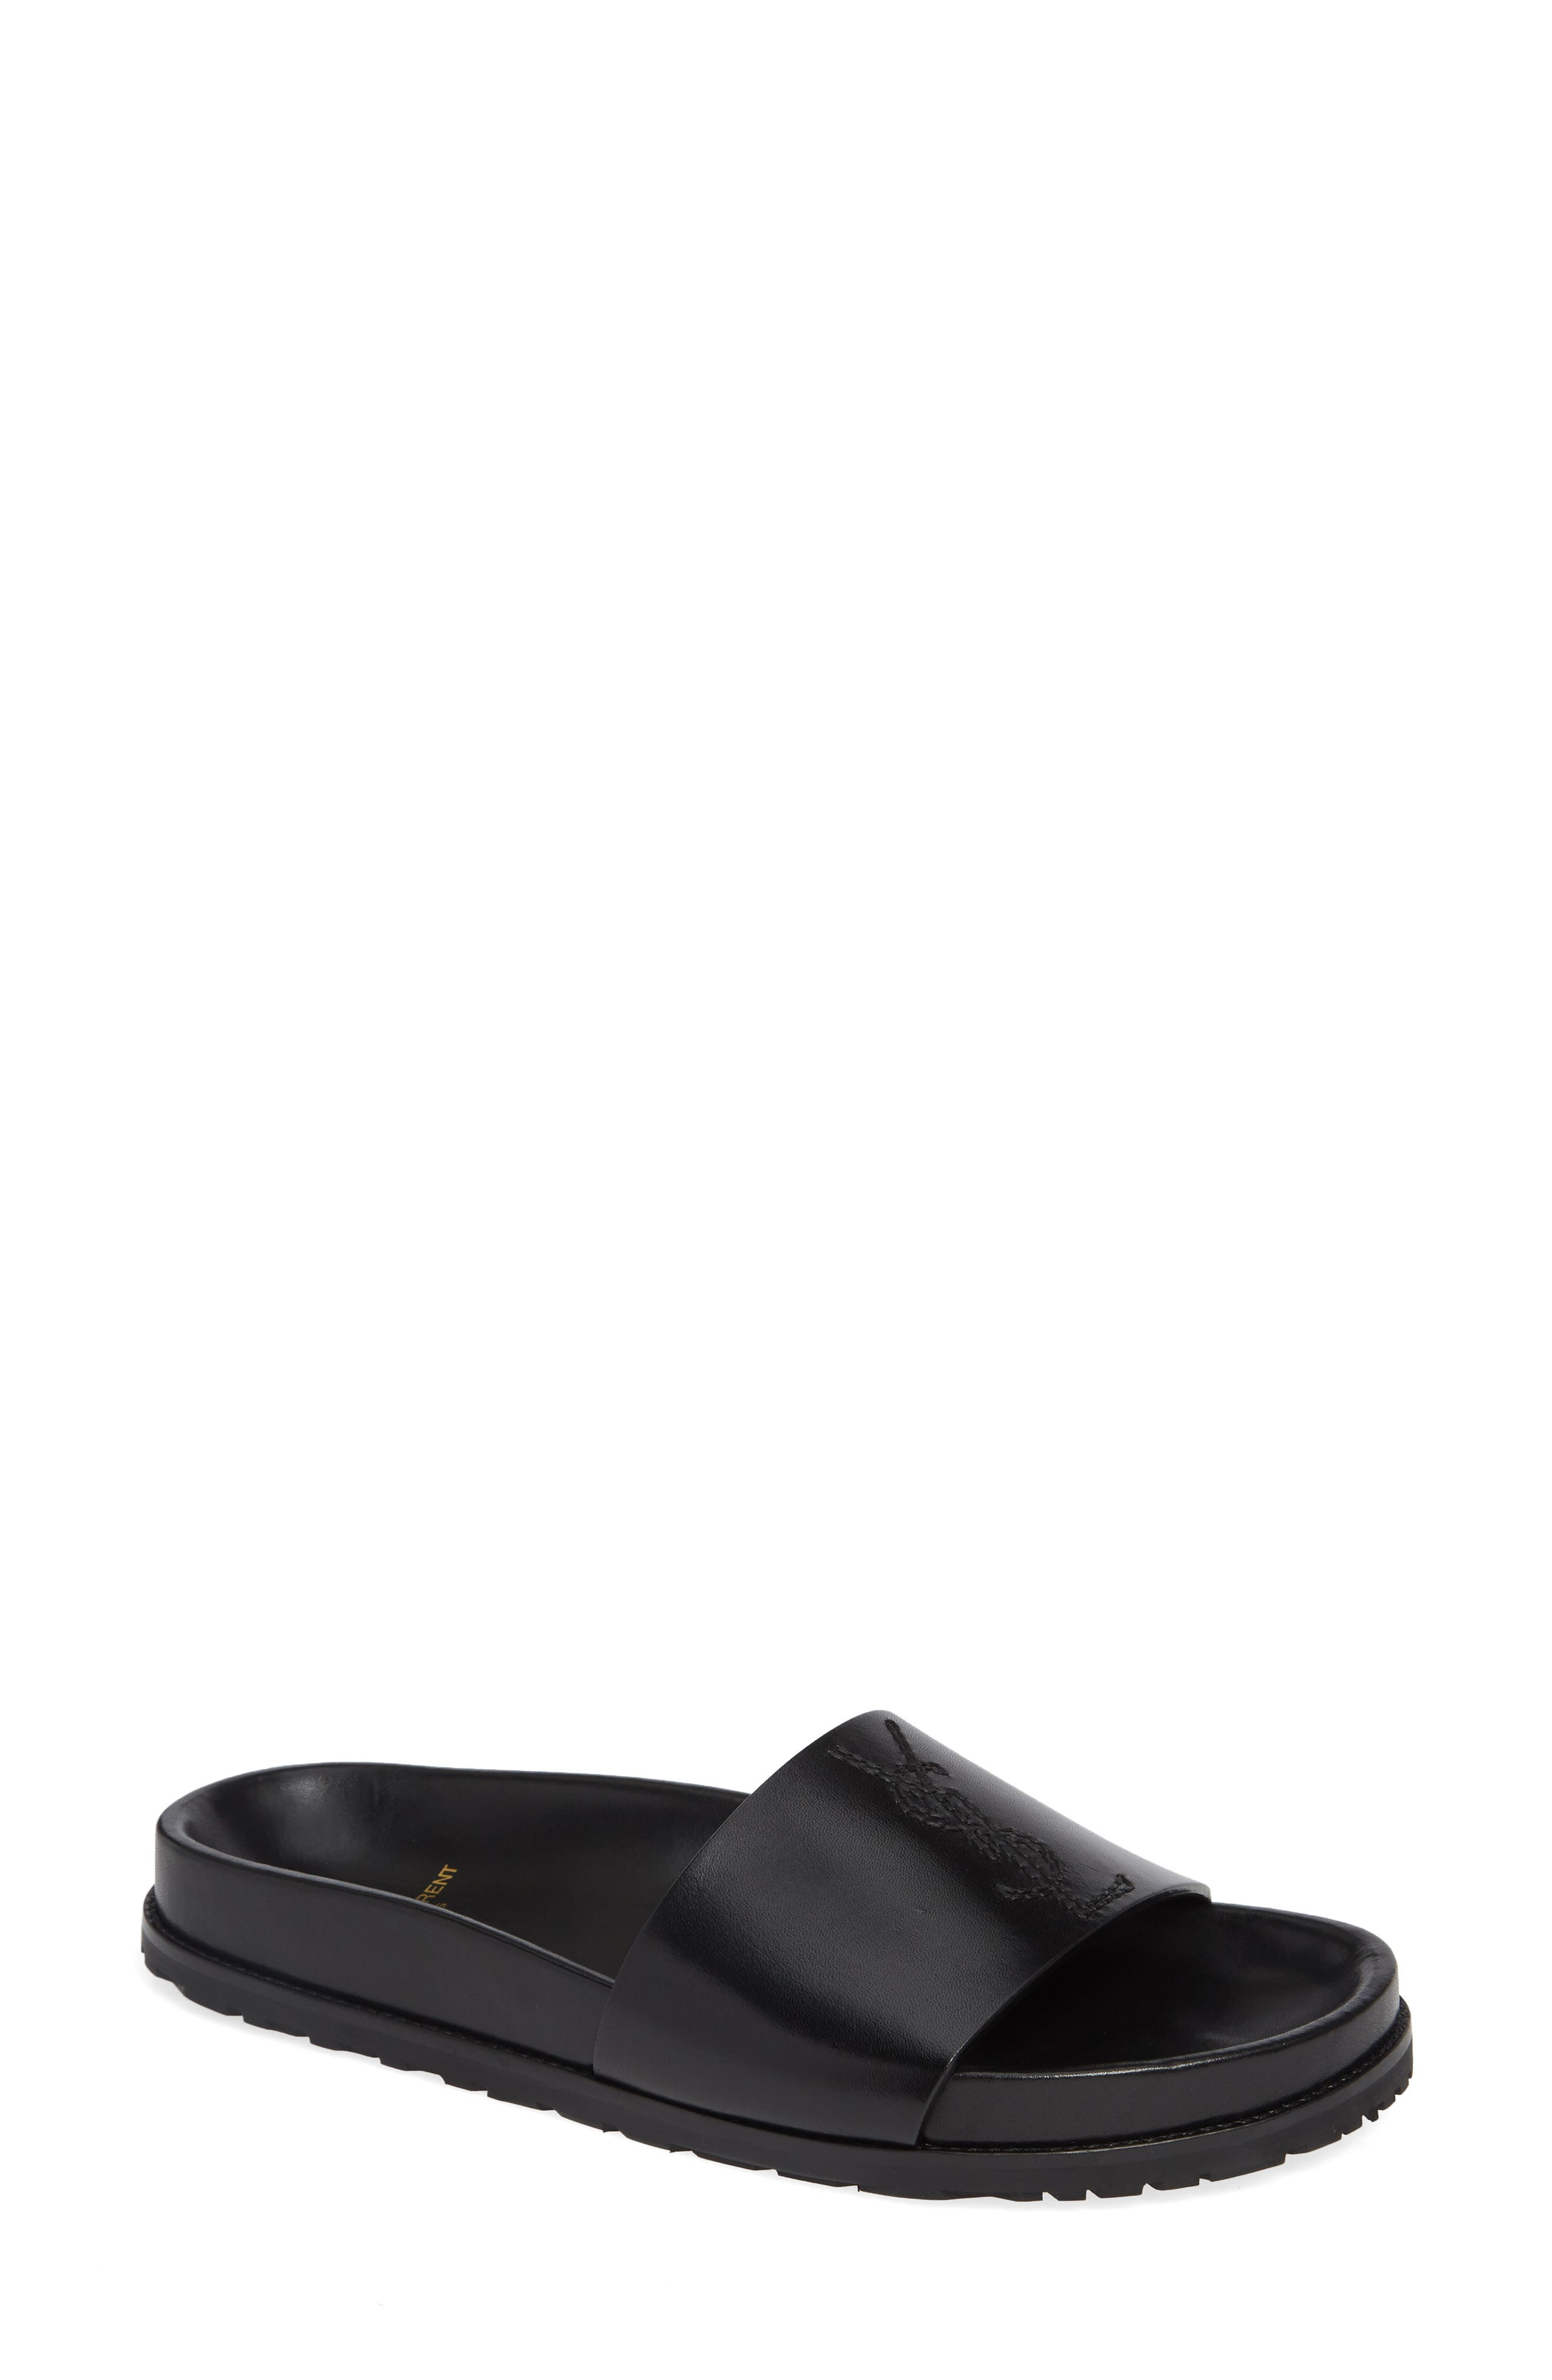 Joan Slide Sandal,                         Main,                         color, BLACK